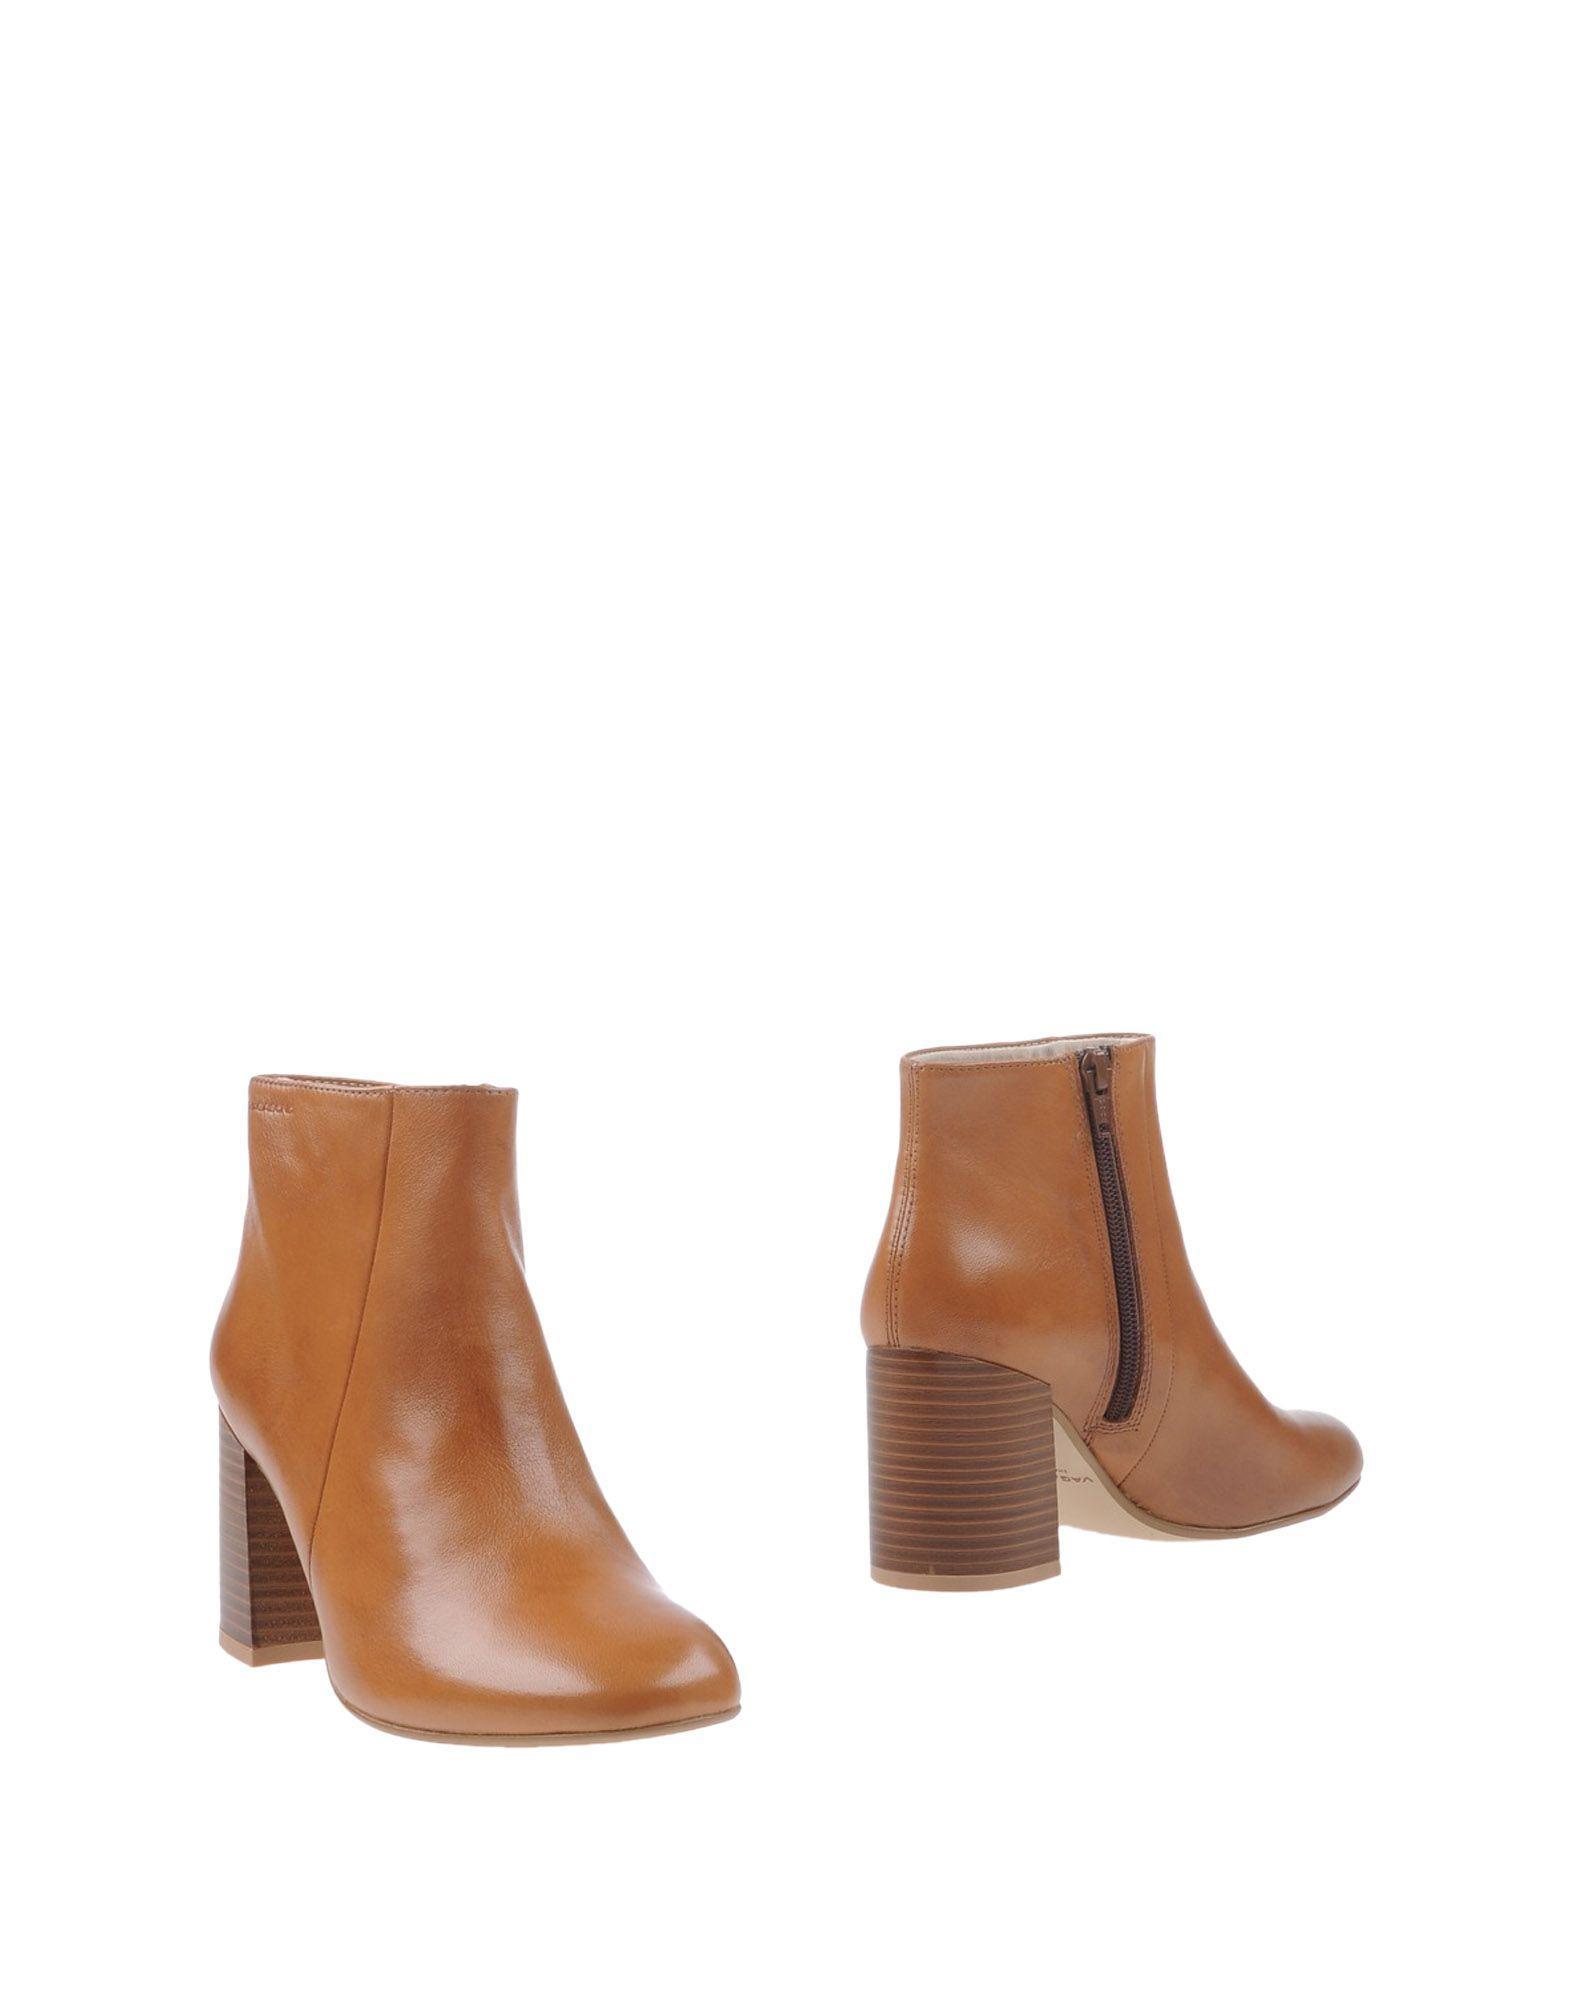 lyst vagabond ankle boots in brown. Black Bedroom Furniture Sets. Home Design Ideas